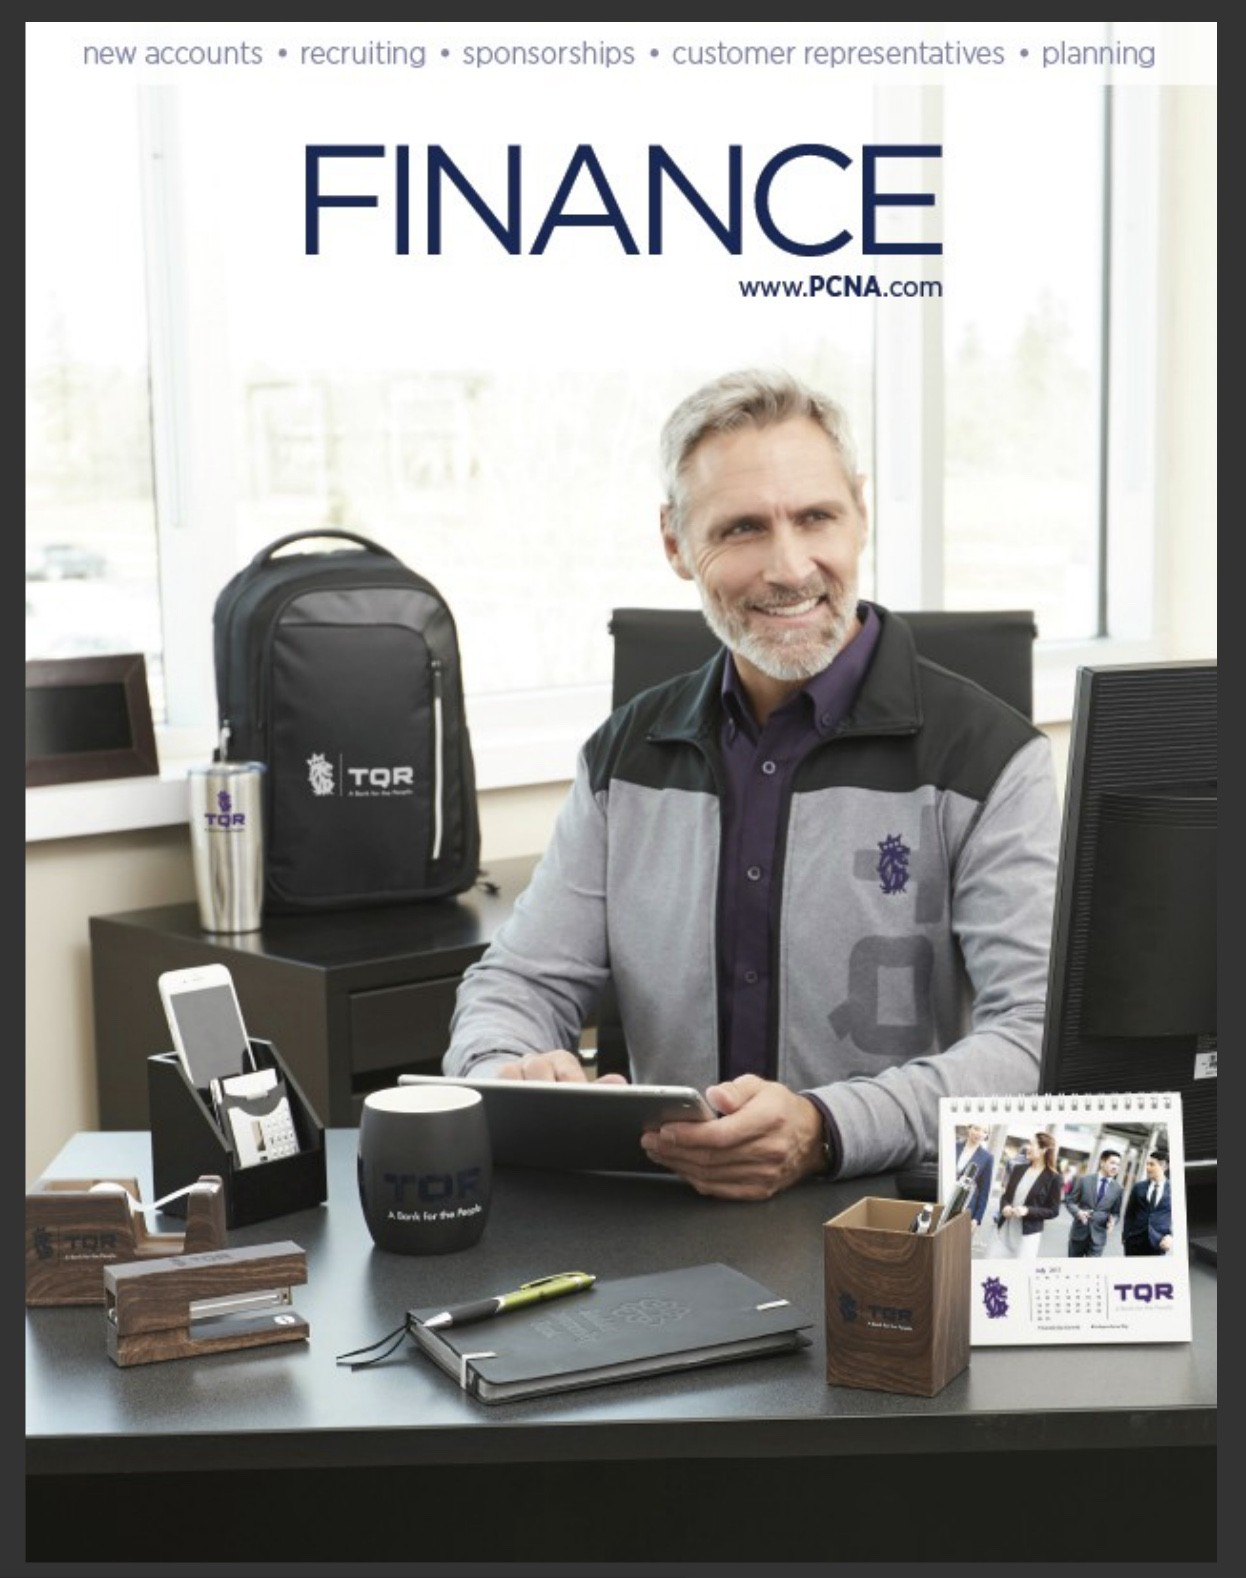 PCNA FINANCE CATALOGUE